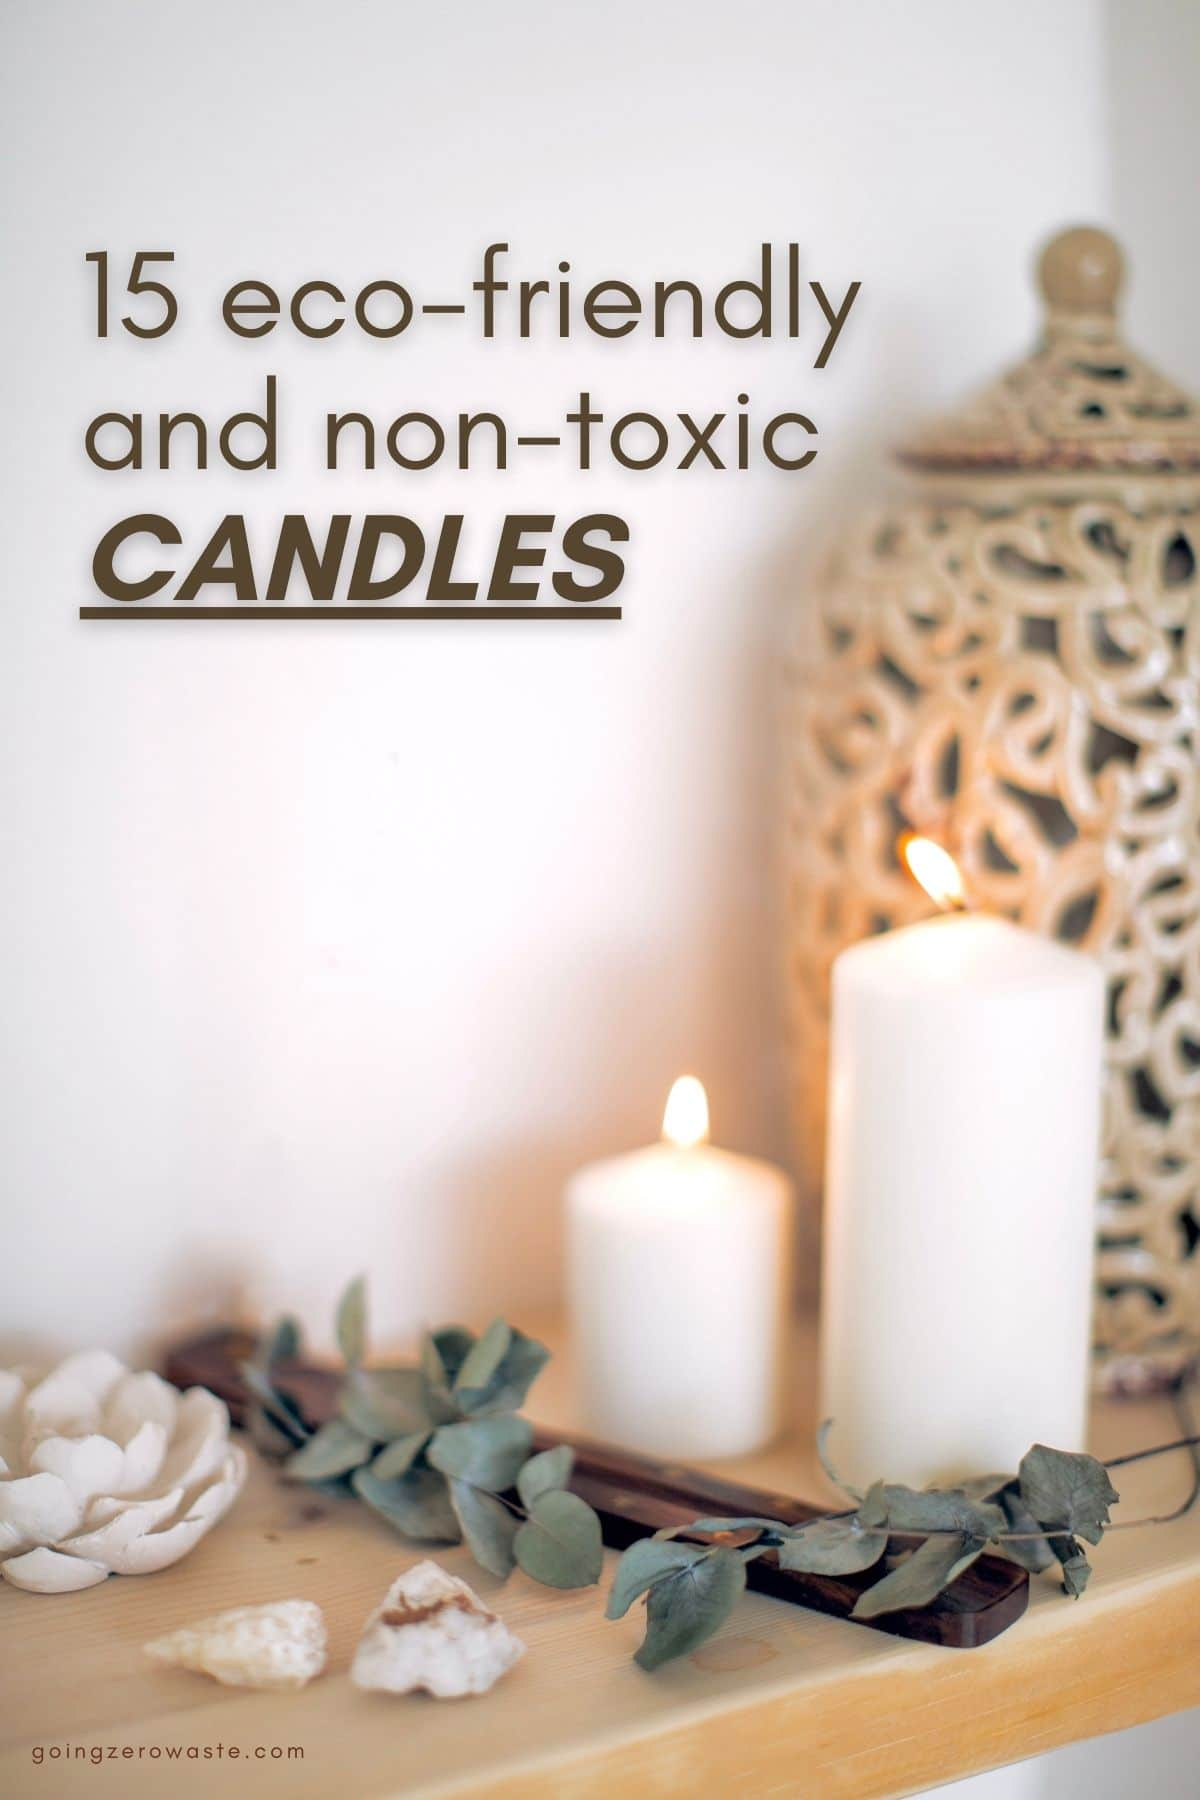 15 Eco-friendly, Non-Toxic Candles